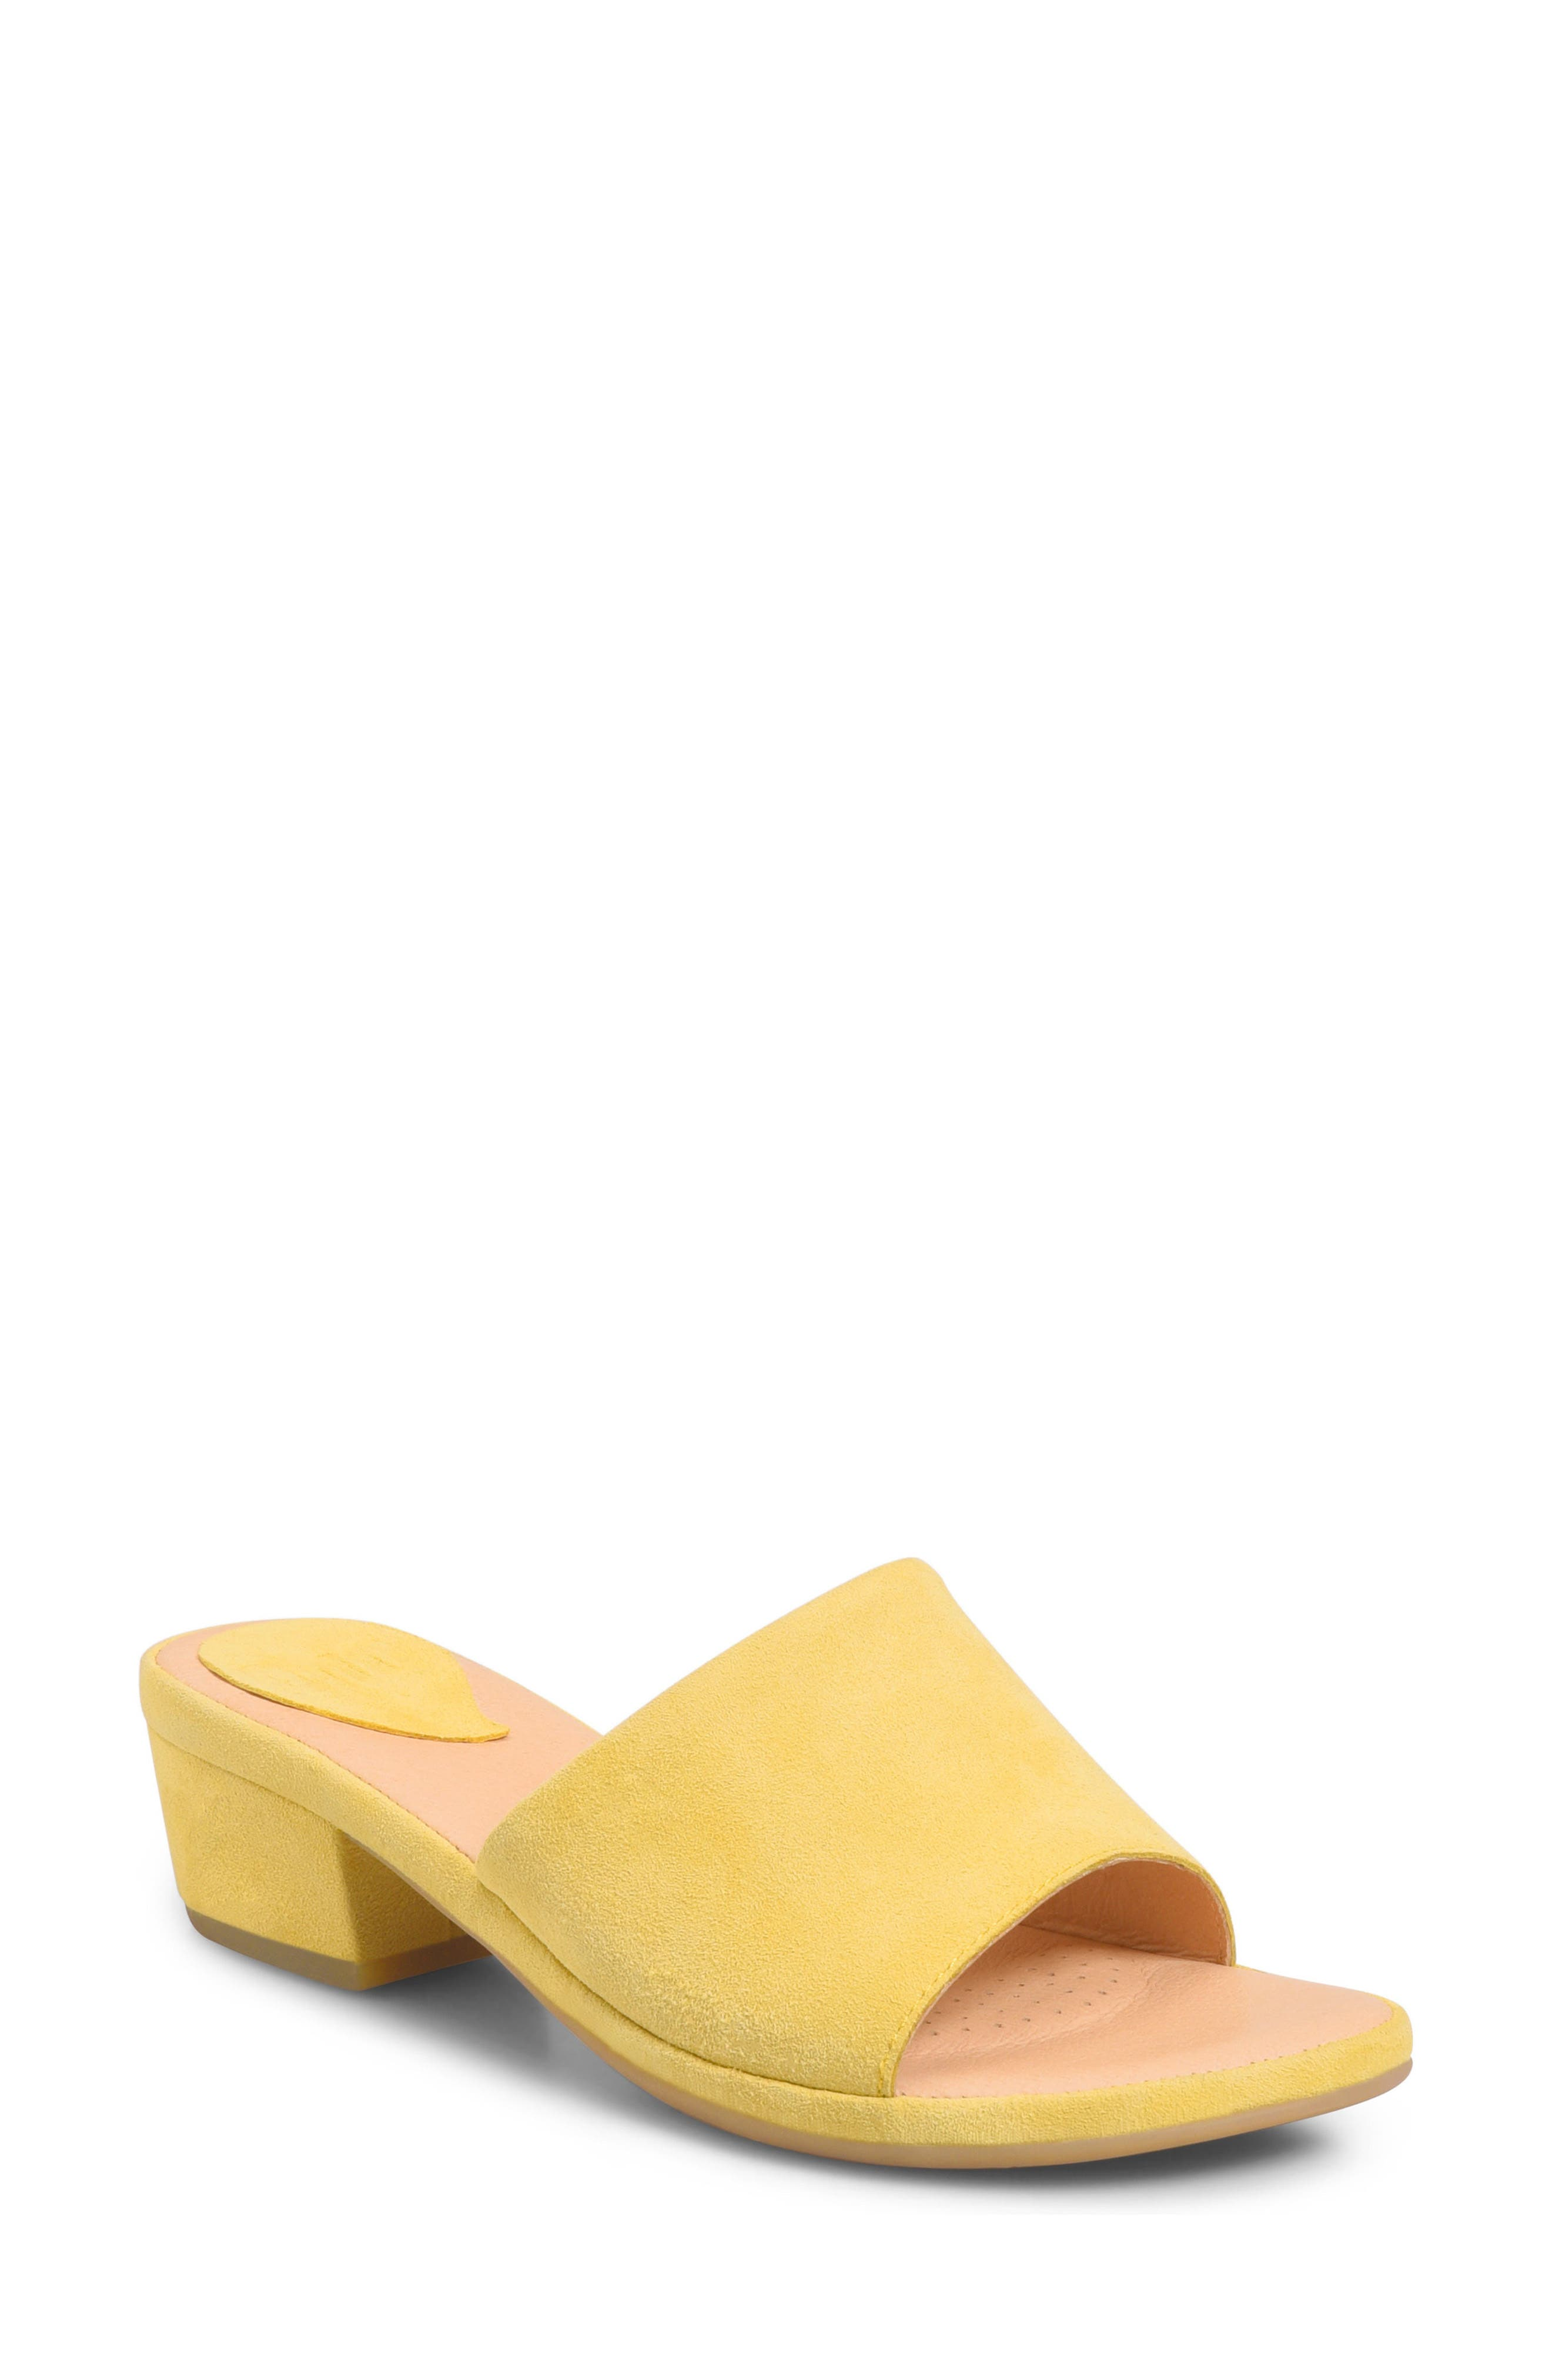 Bo Block Heel Slide Sandal,                         Main,                         color, Yellow Suede